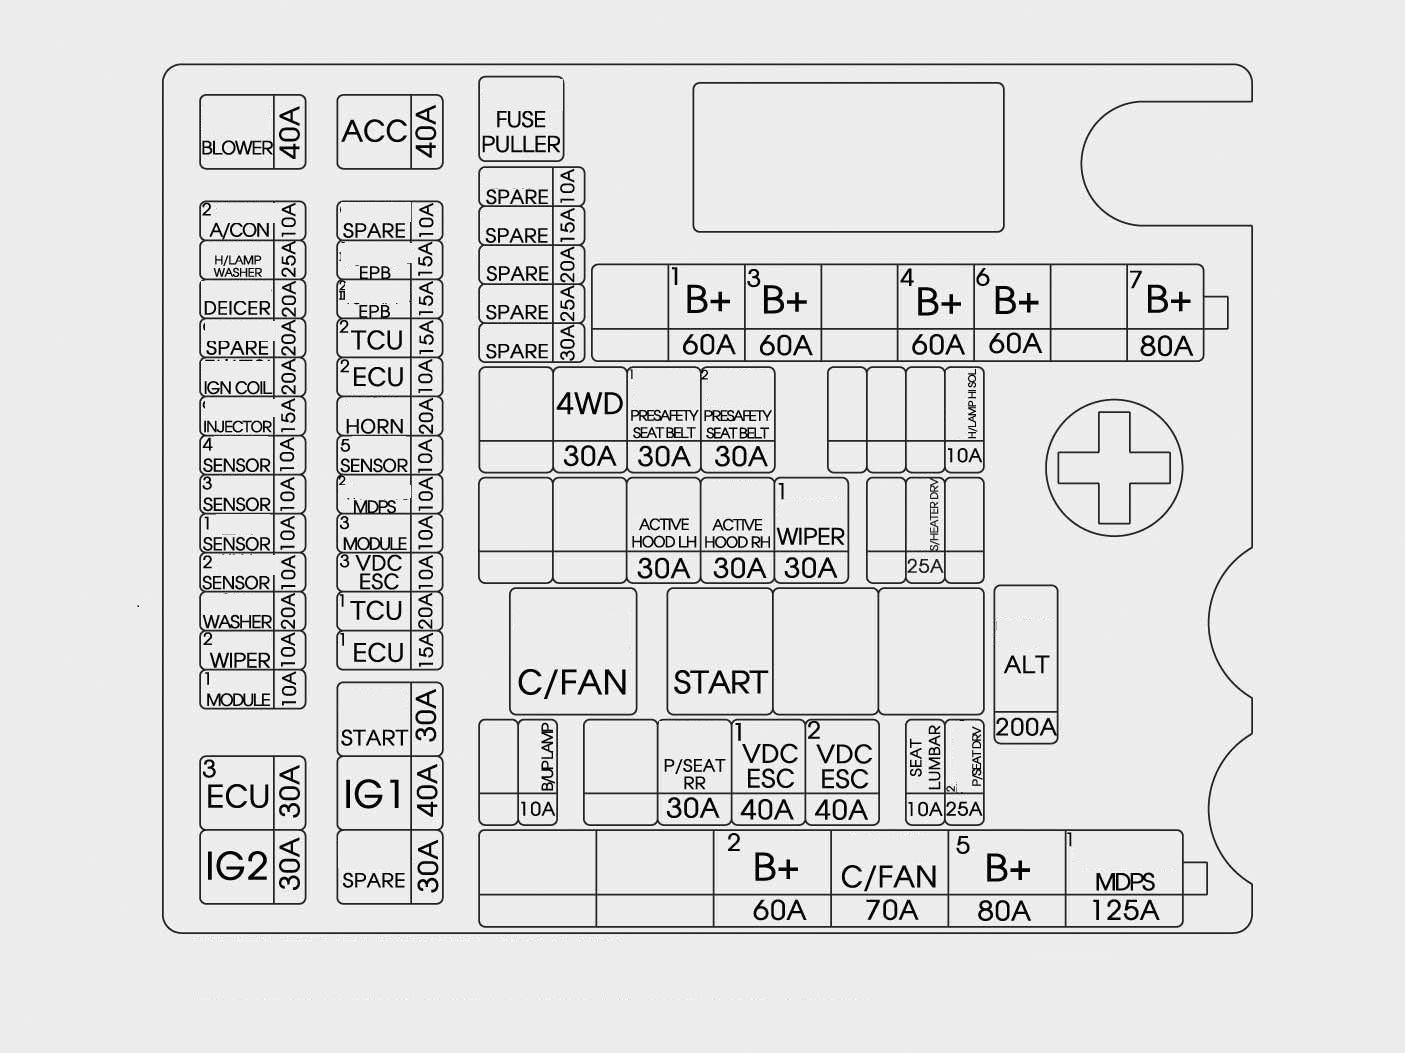 hyundai atos ecu wiring diagram vl stereo 1997 engine diagrams